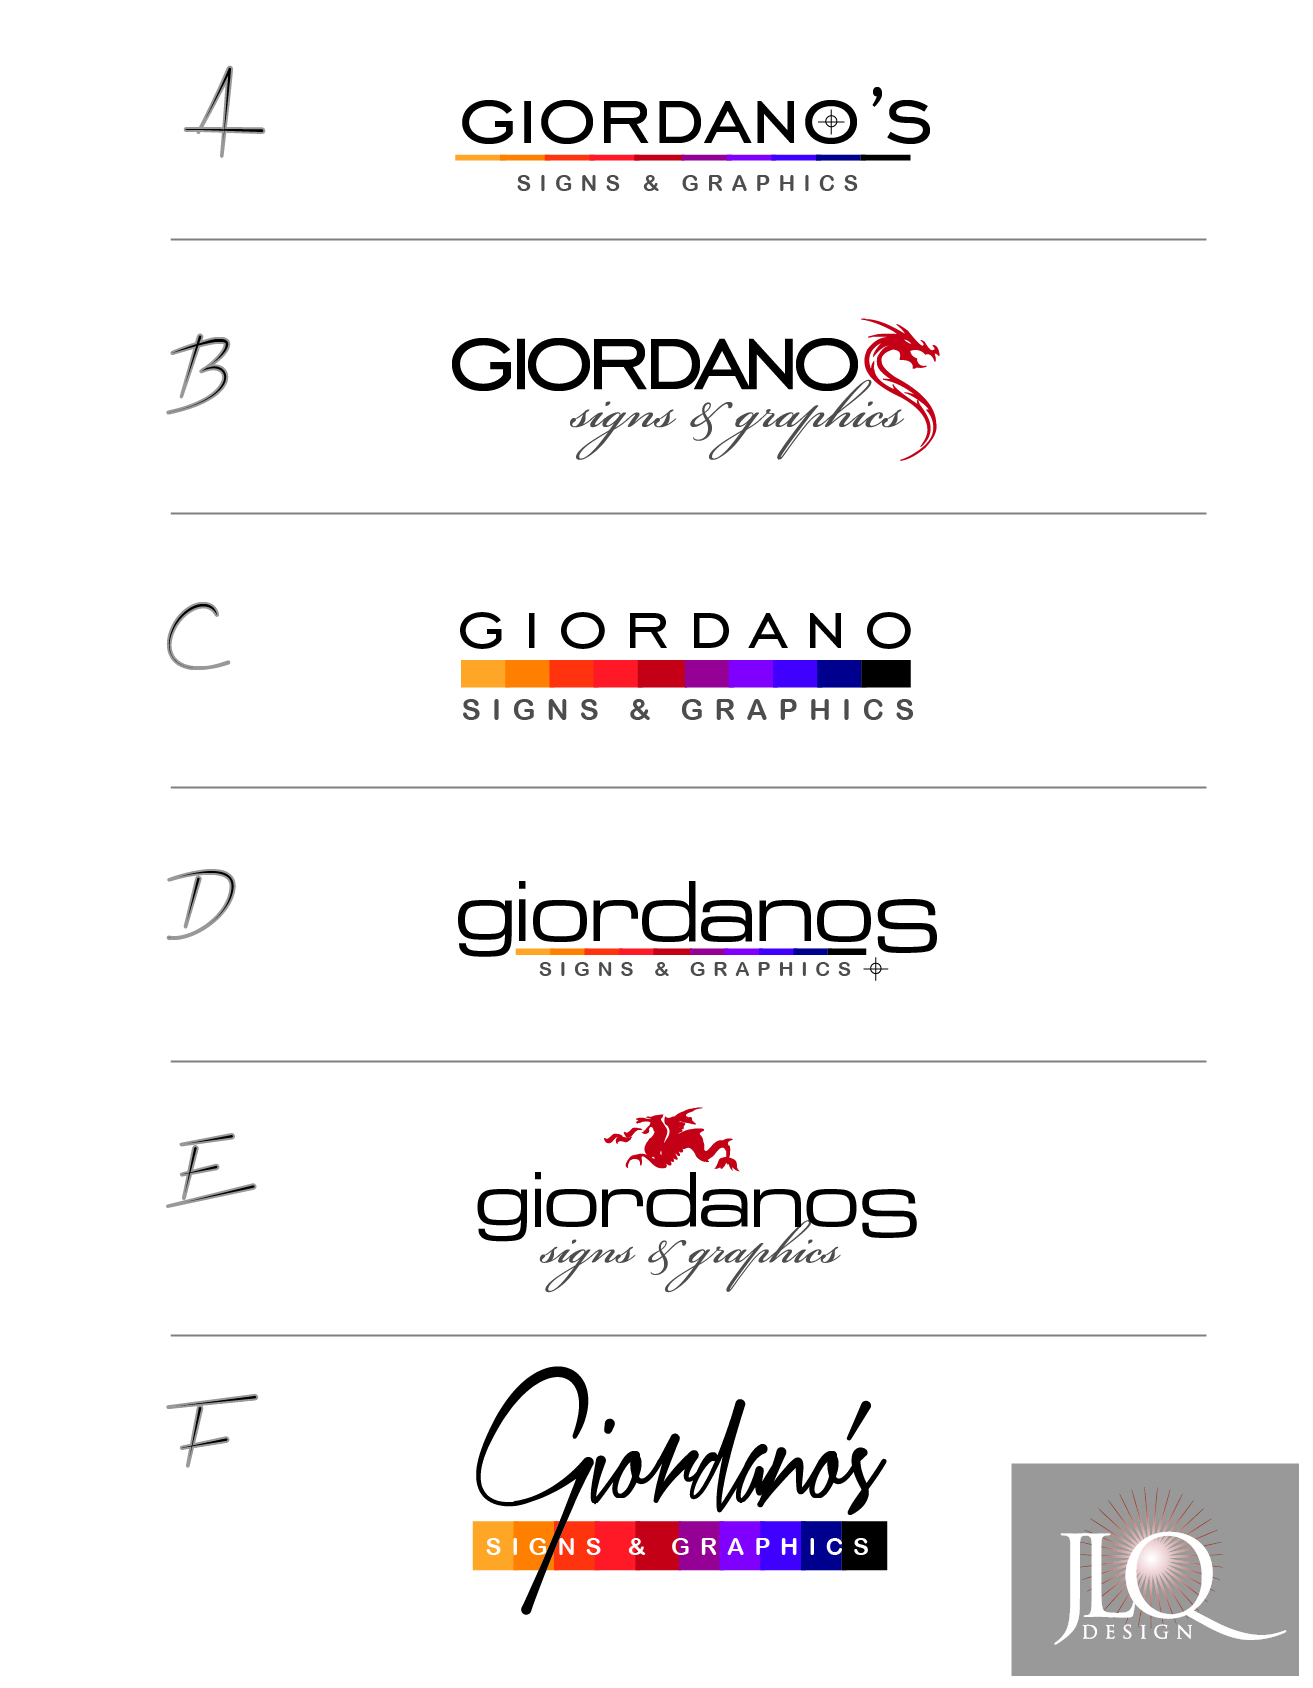 Giordanos coupons 2019